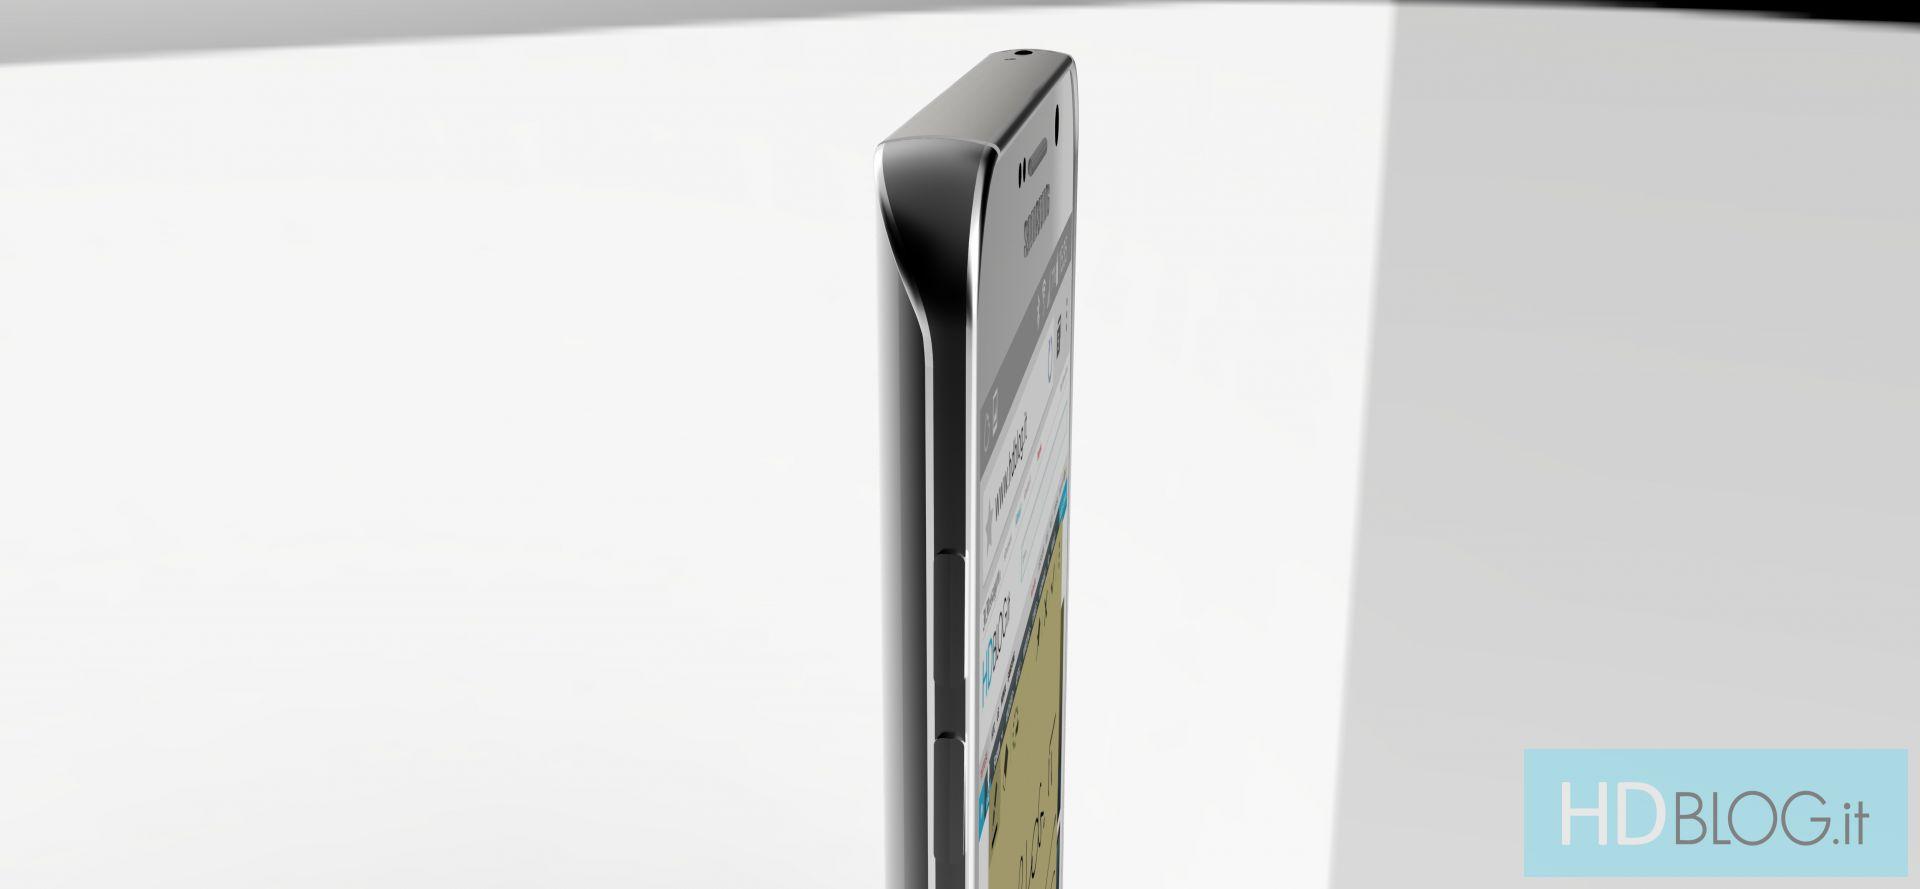 Galaxy-Note-5-schematics-and-concept-renders-24.jpg